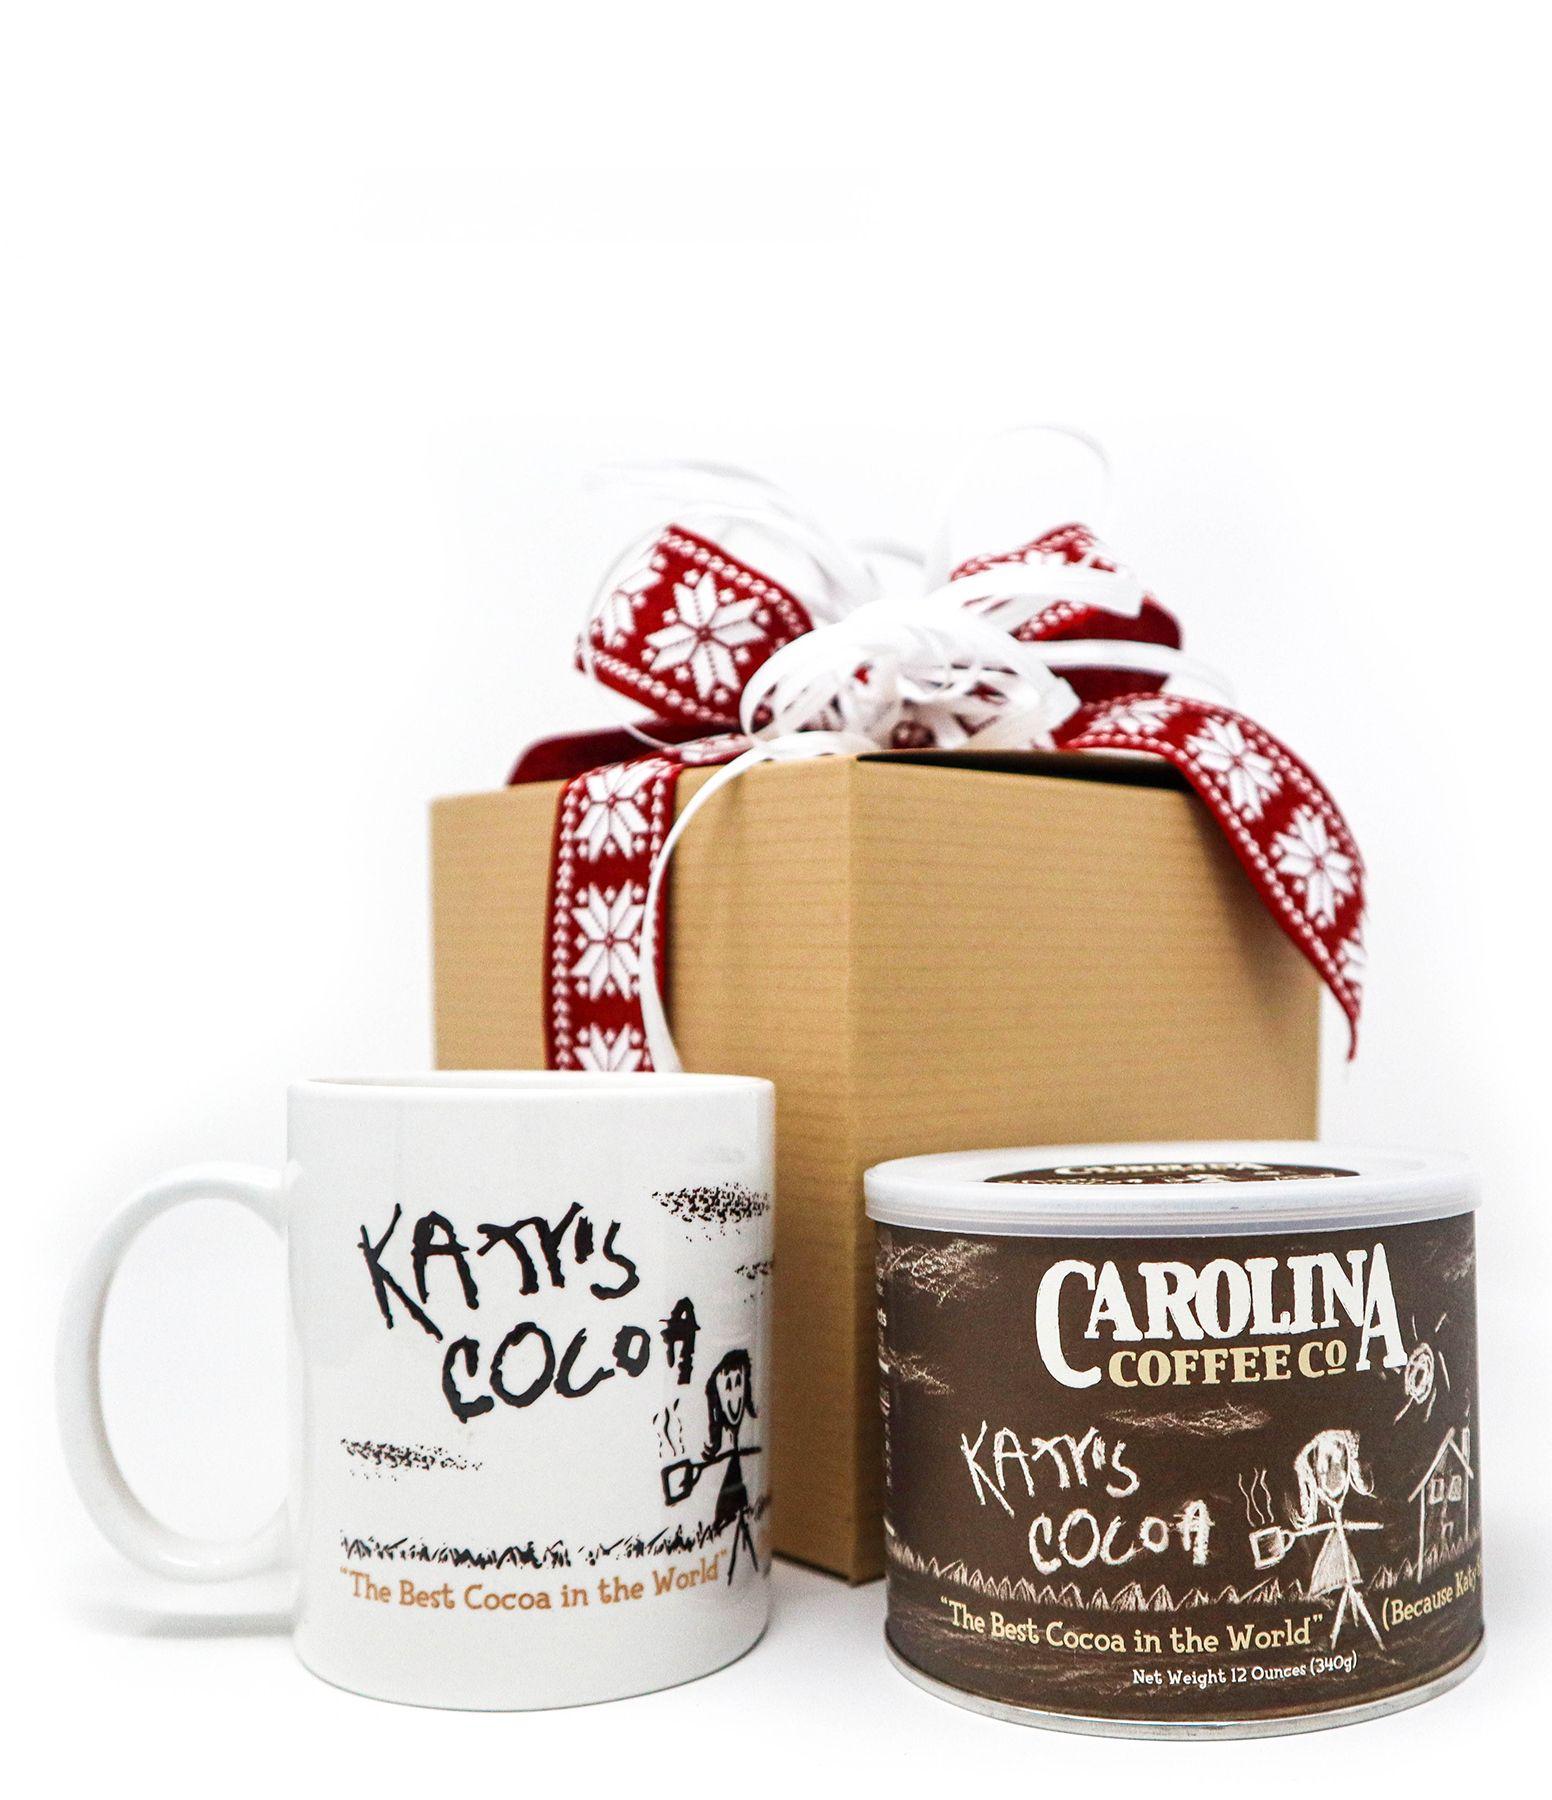 Carolina Coffee Designs By Katy